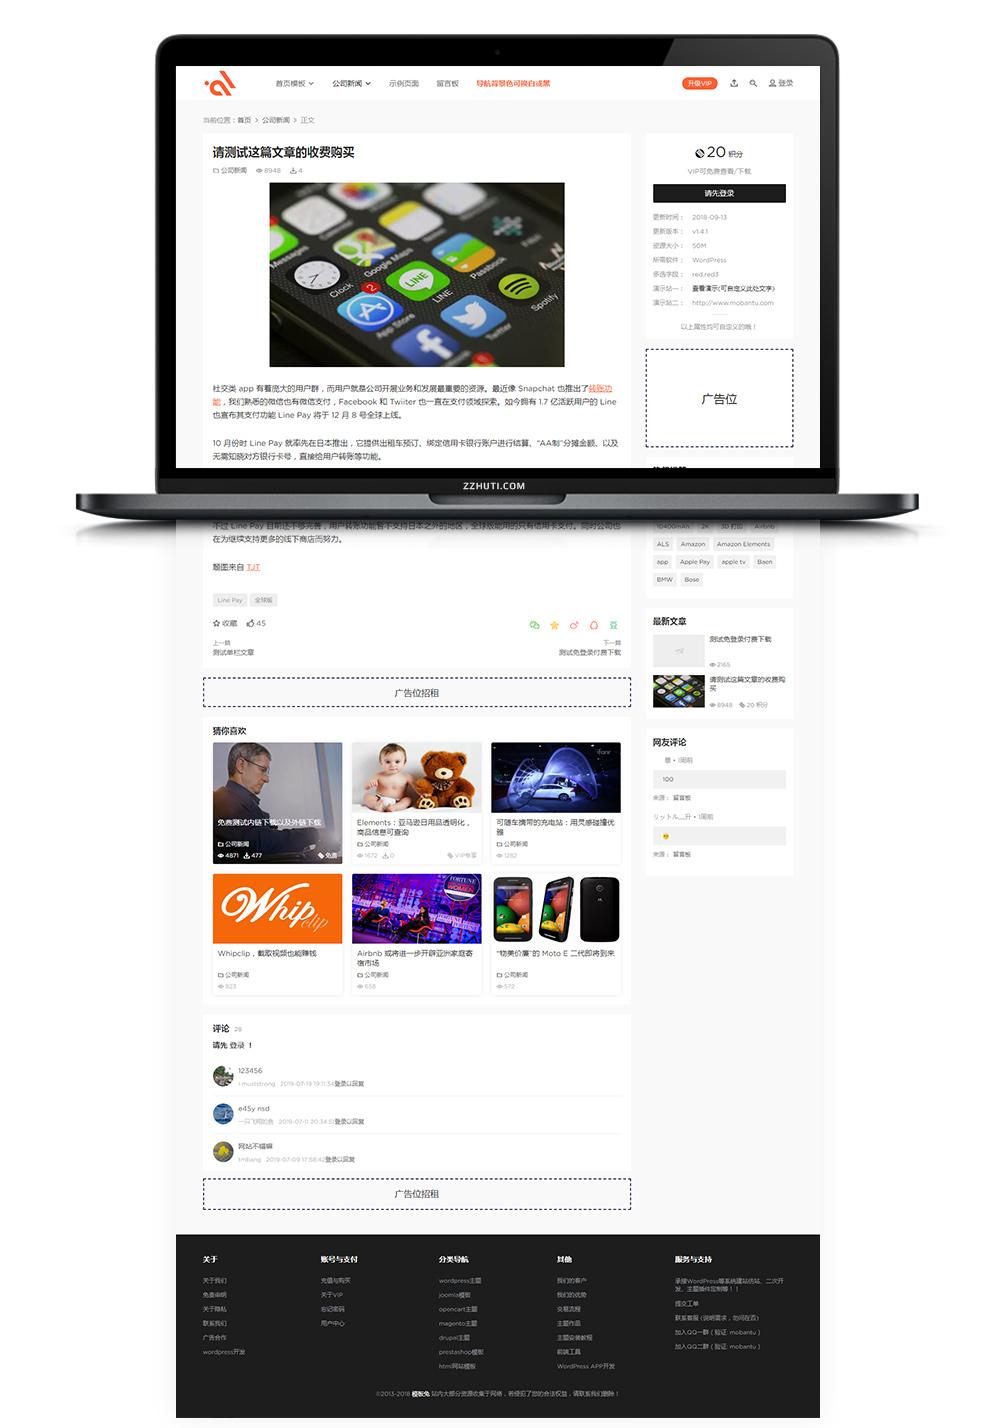 Modown V2.0 资源素材图片付费下载WordPress主题模板开心版赠送Erphpdown配套插件-找主题源码